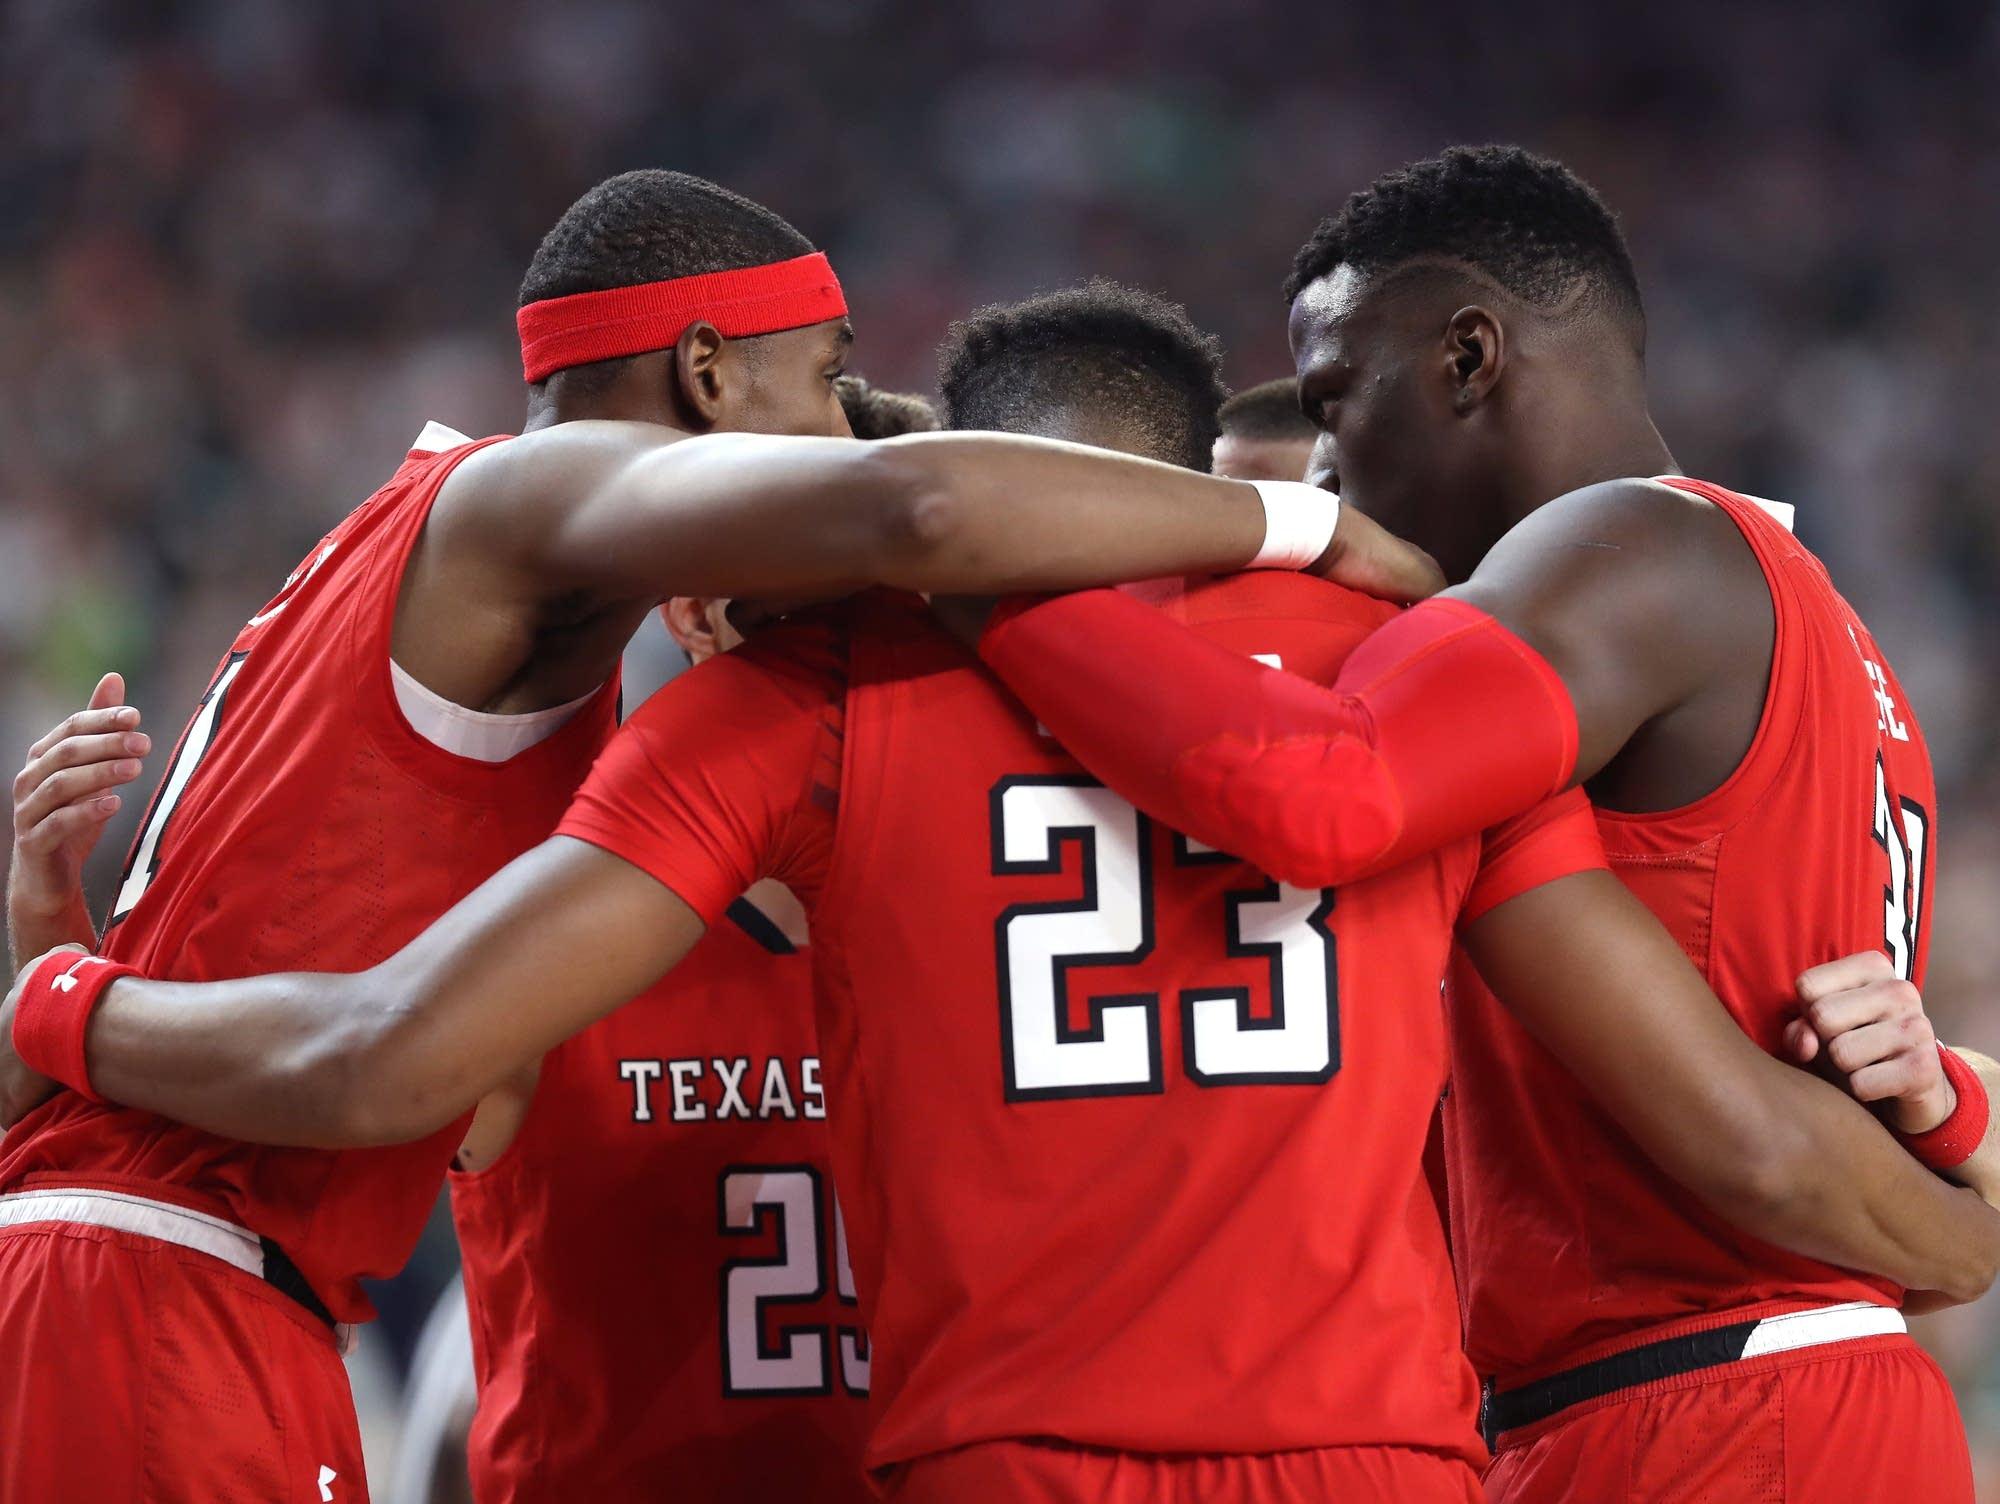 Texas Tech players huddle